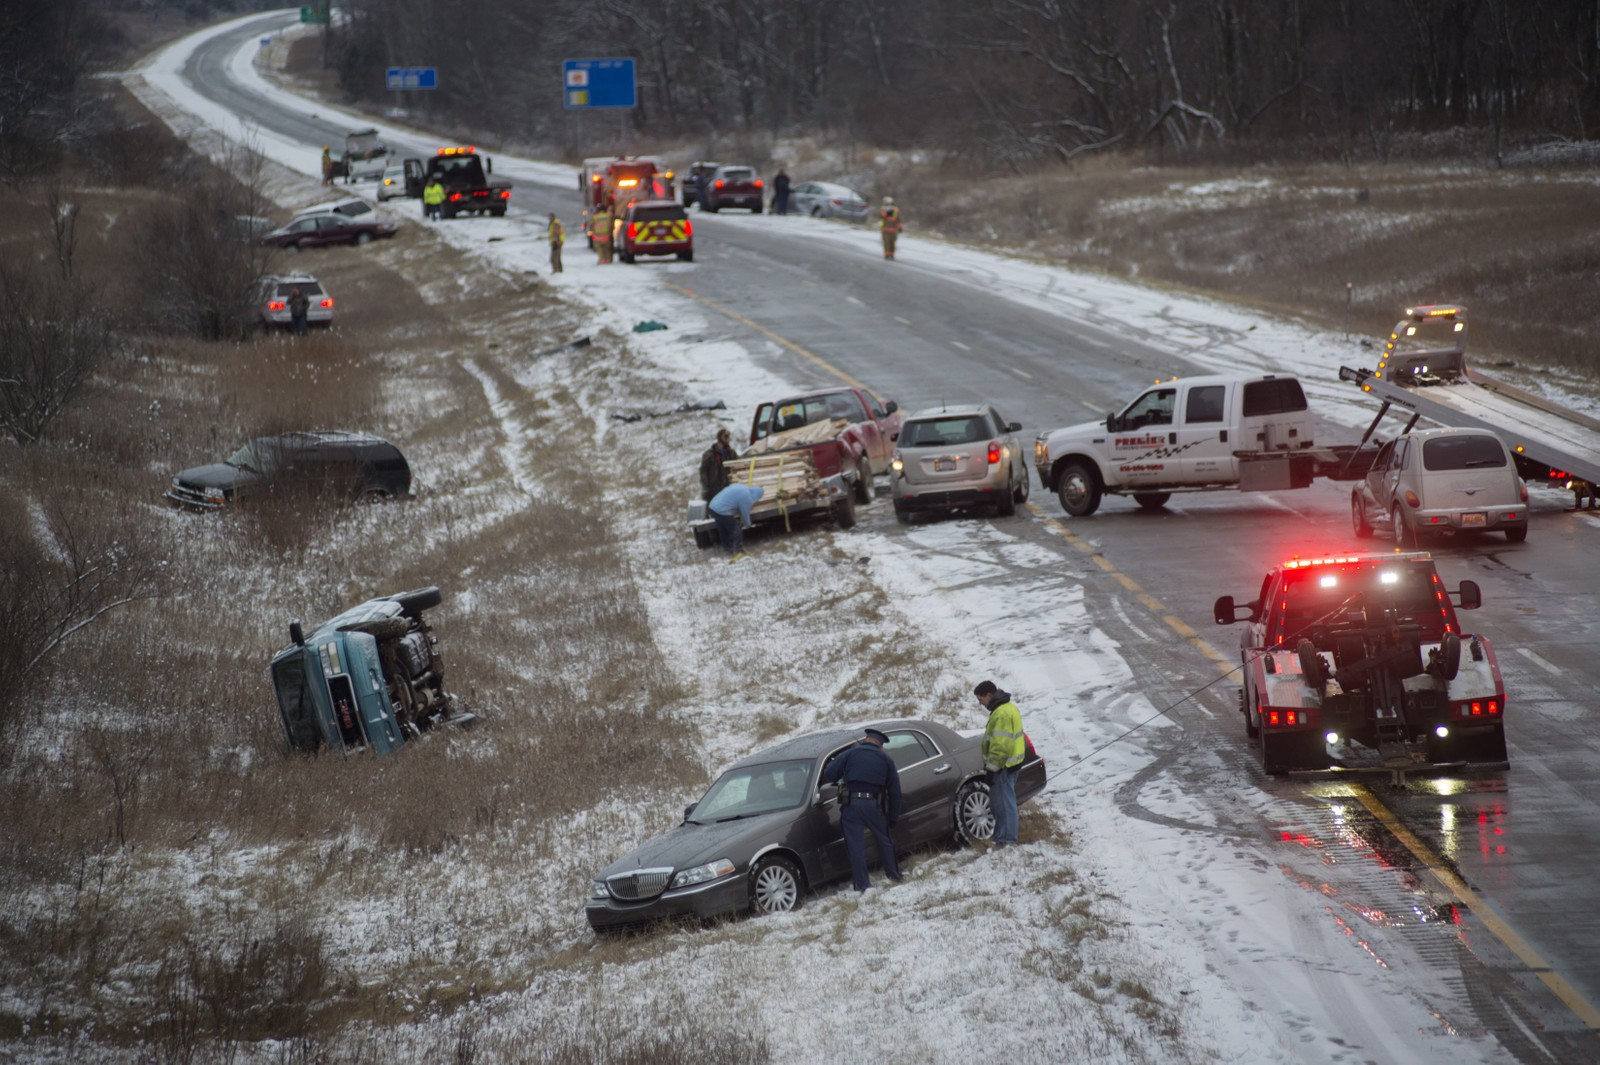 Biler lå strødd langs den ekstremt glatte veien i Cedar Springs, Michigan i desember.